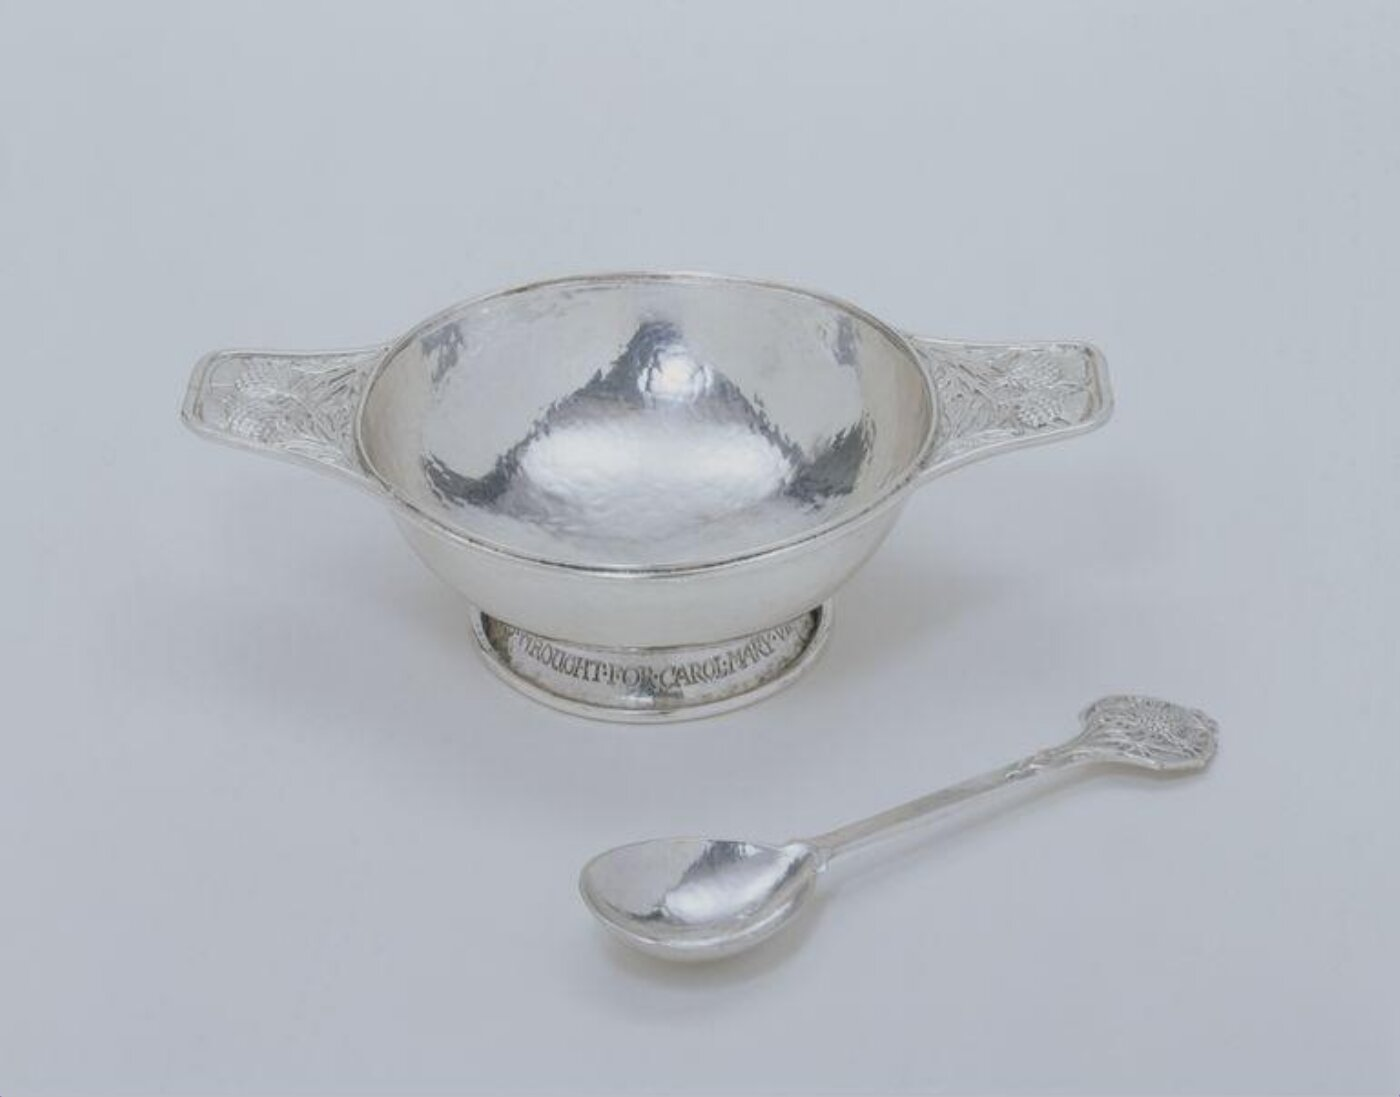 Christening spoon by Omar Ramsden